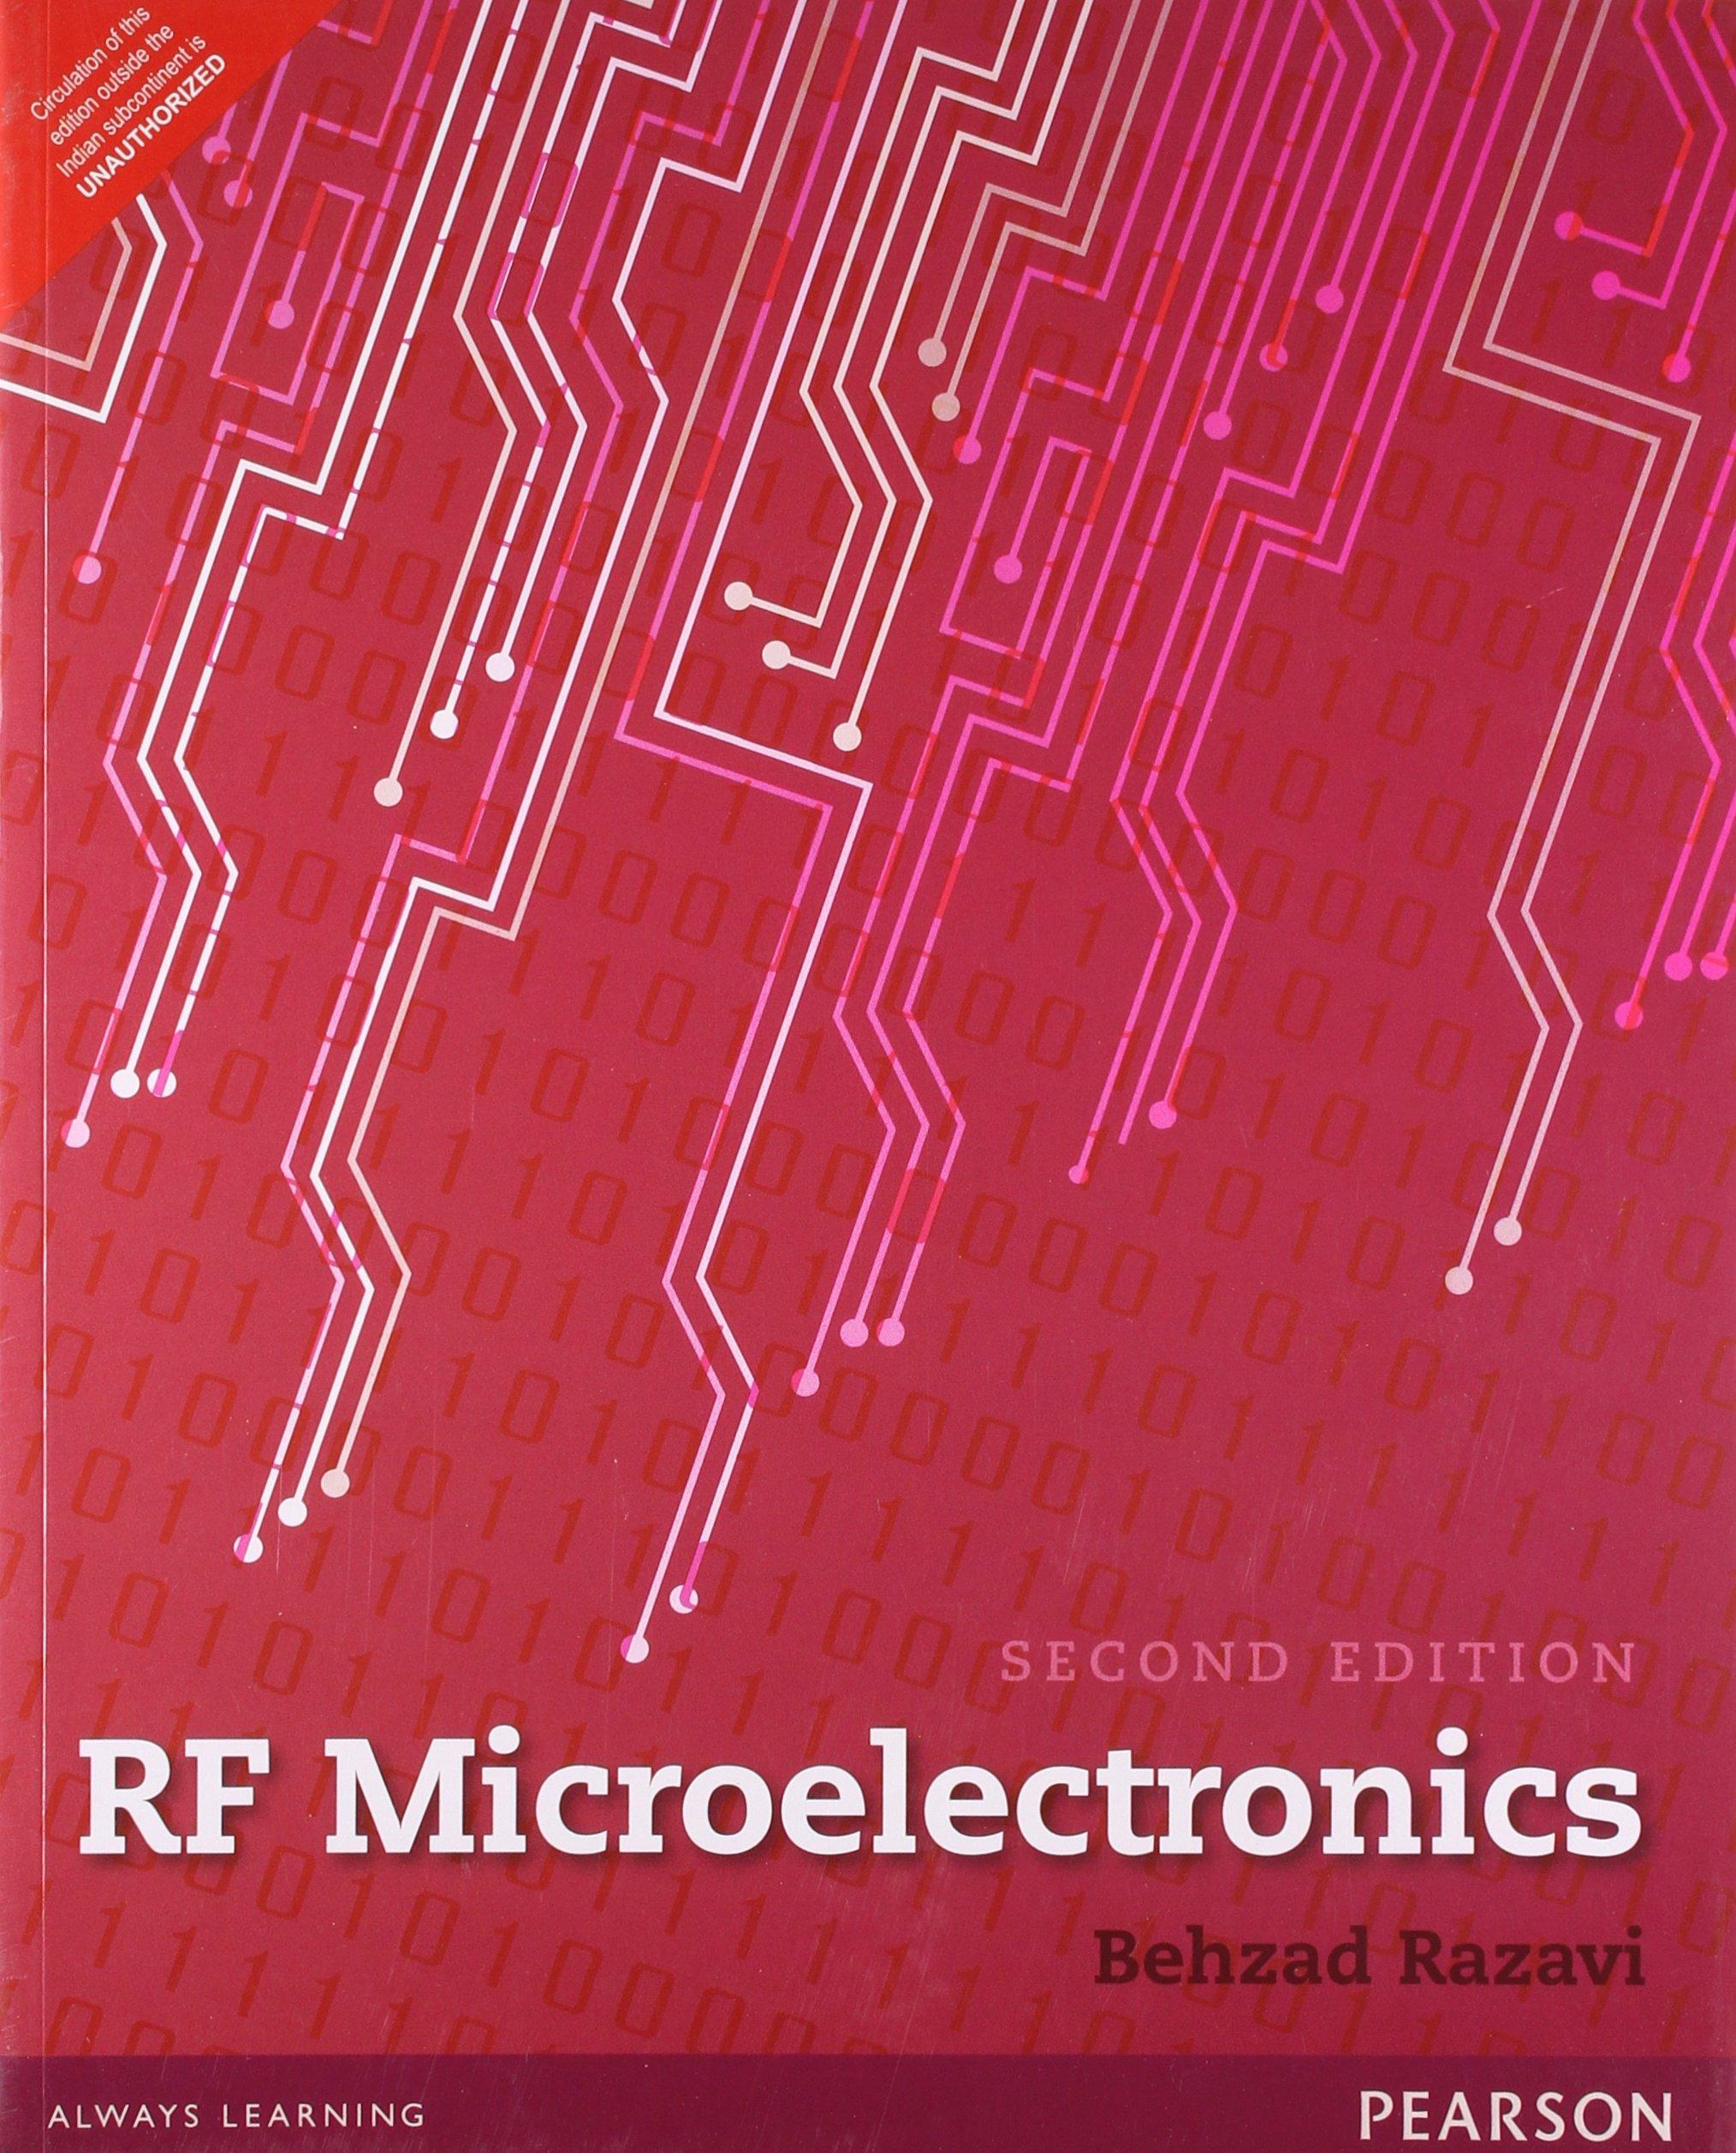 RF Microelectronics: Behzad Razavi: 9789332518636: Amazon com: Books